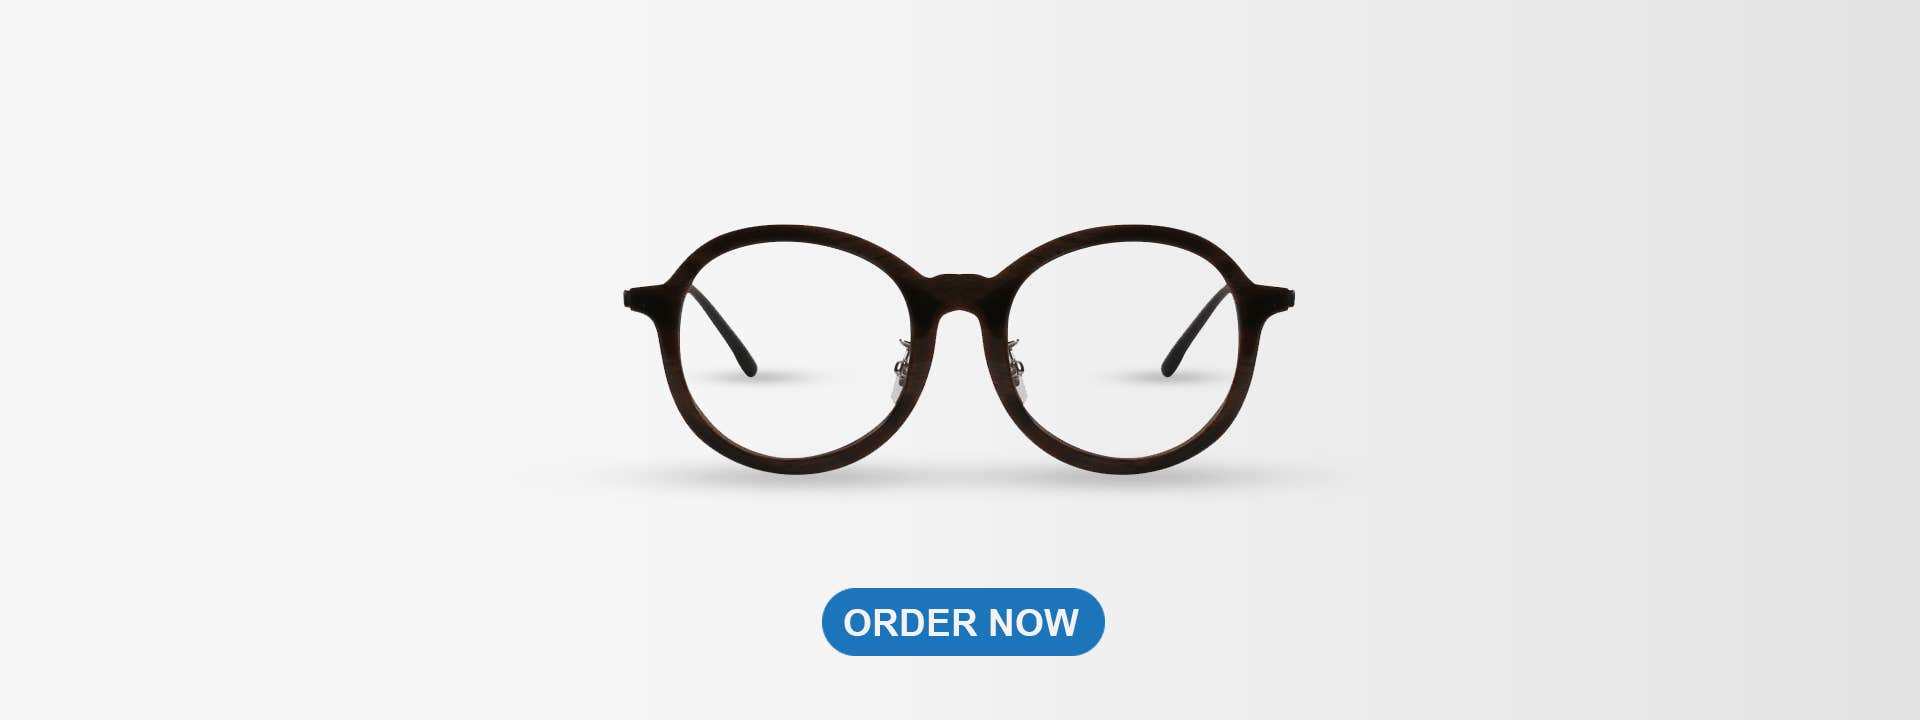 Buy 123040-C Round Eyeglasses Here